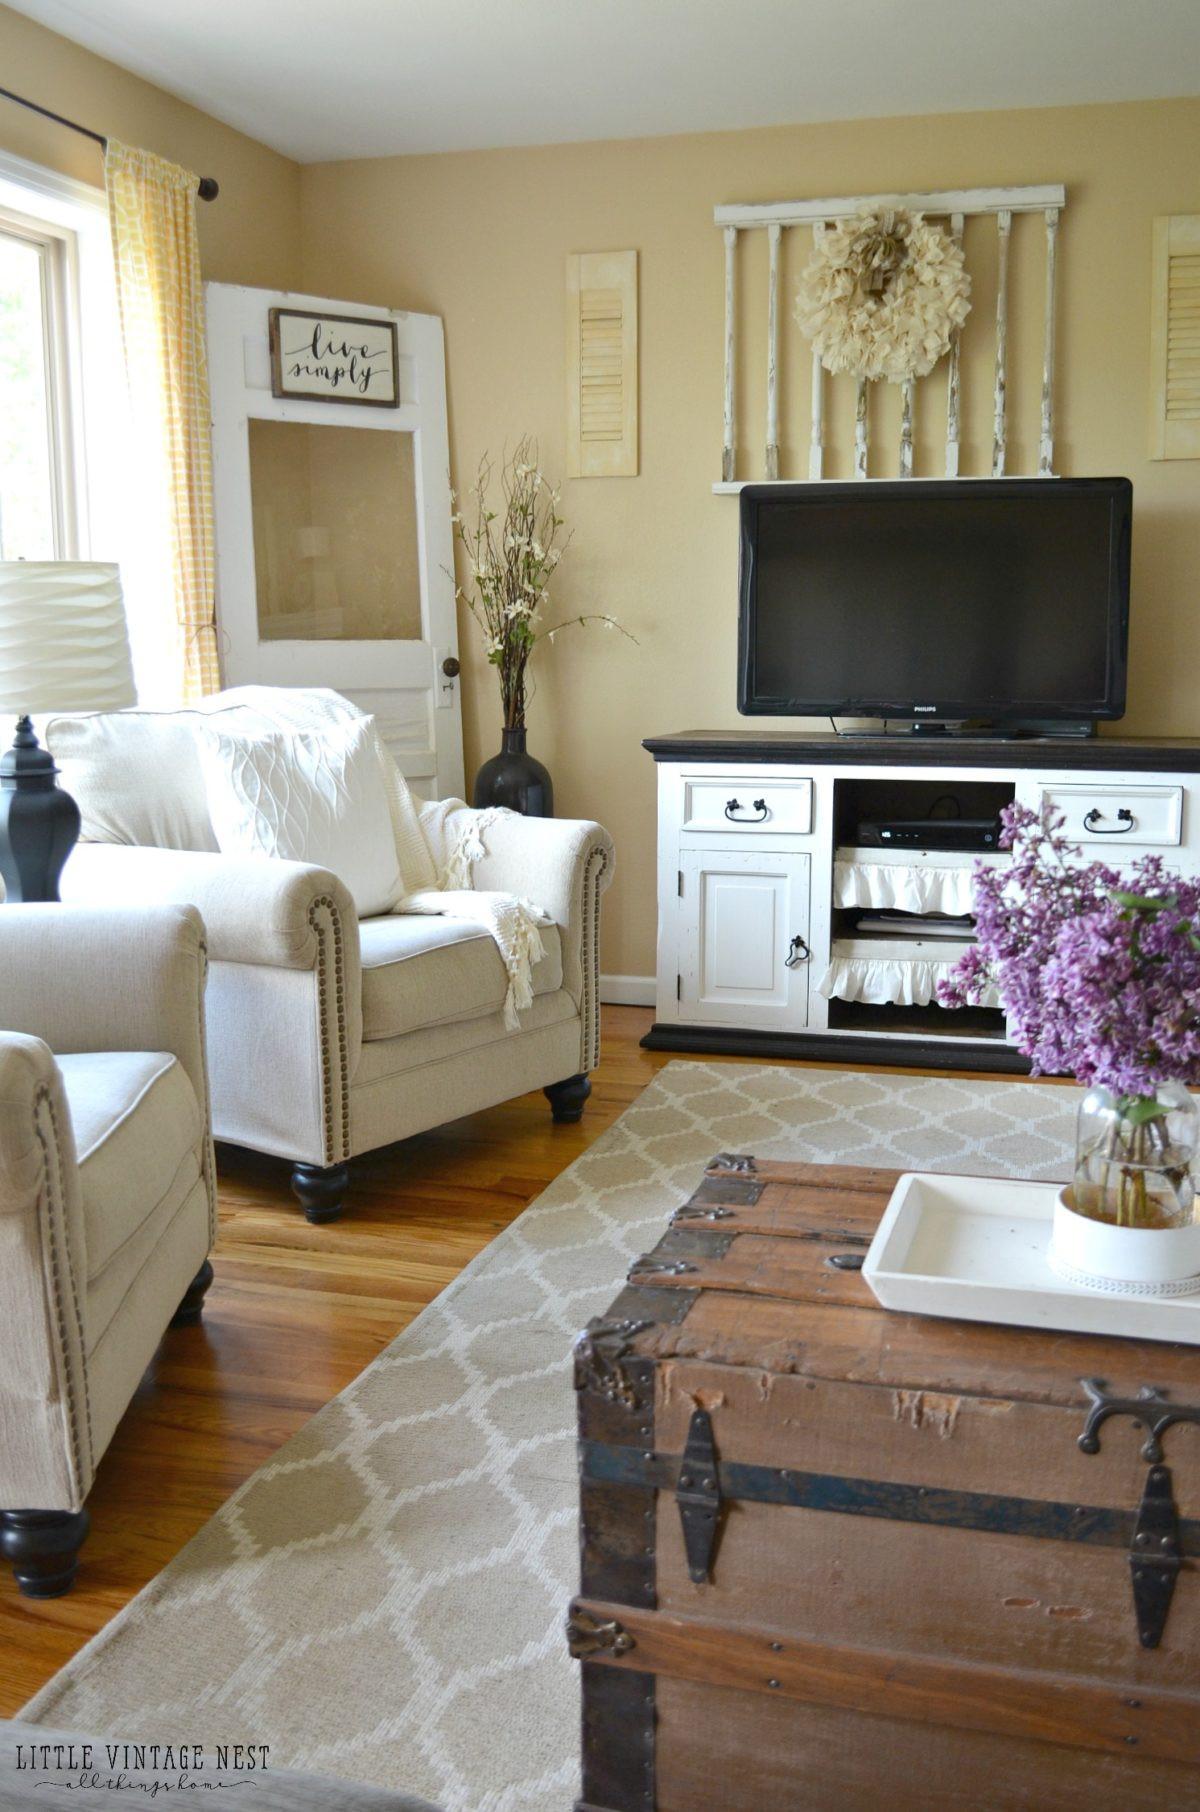 Best ideas about Farmhouse Style Living Room Furniture . Save or Pin Farmhouse Living Room Summer Refresh Little Vintage Nest Now.